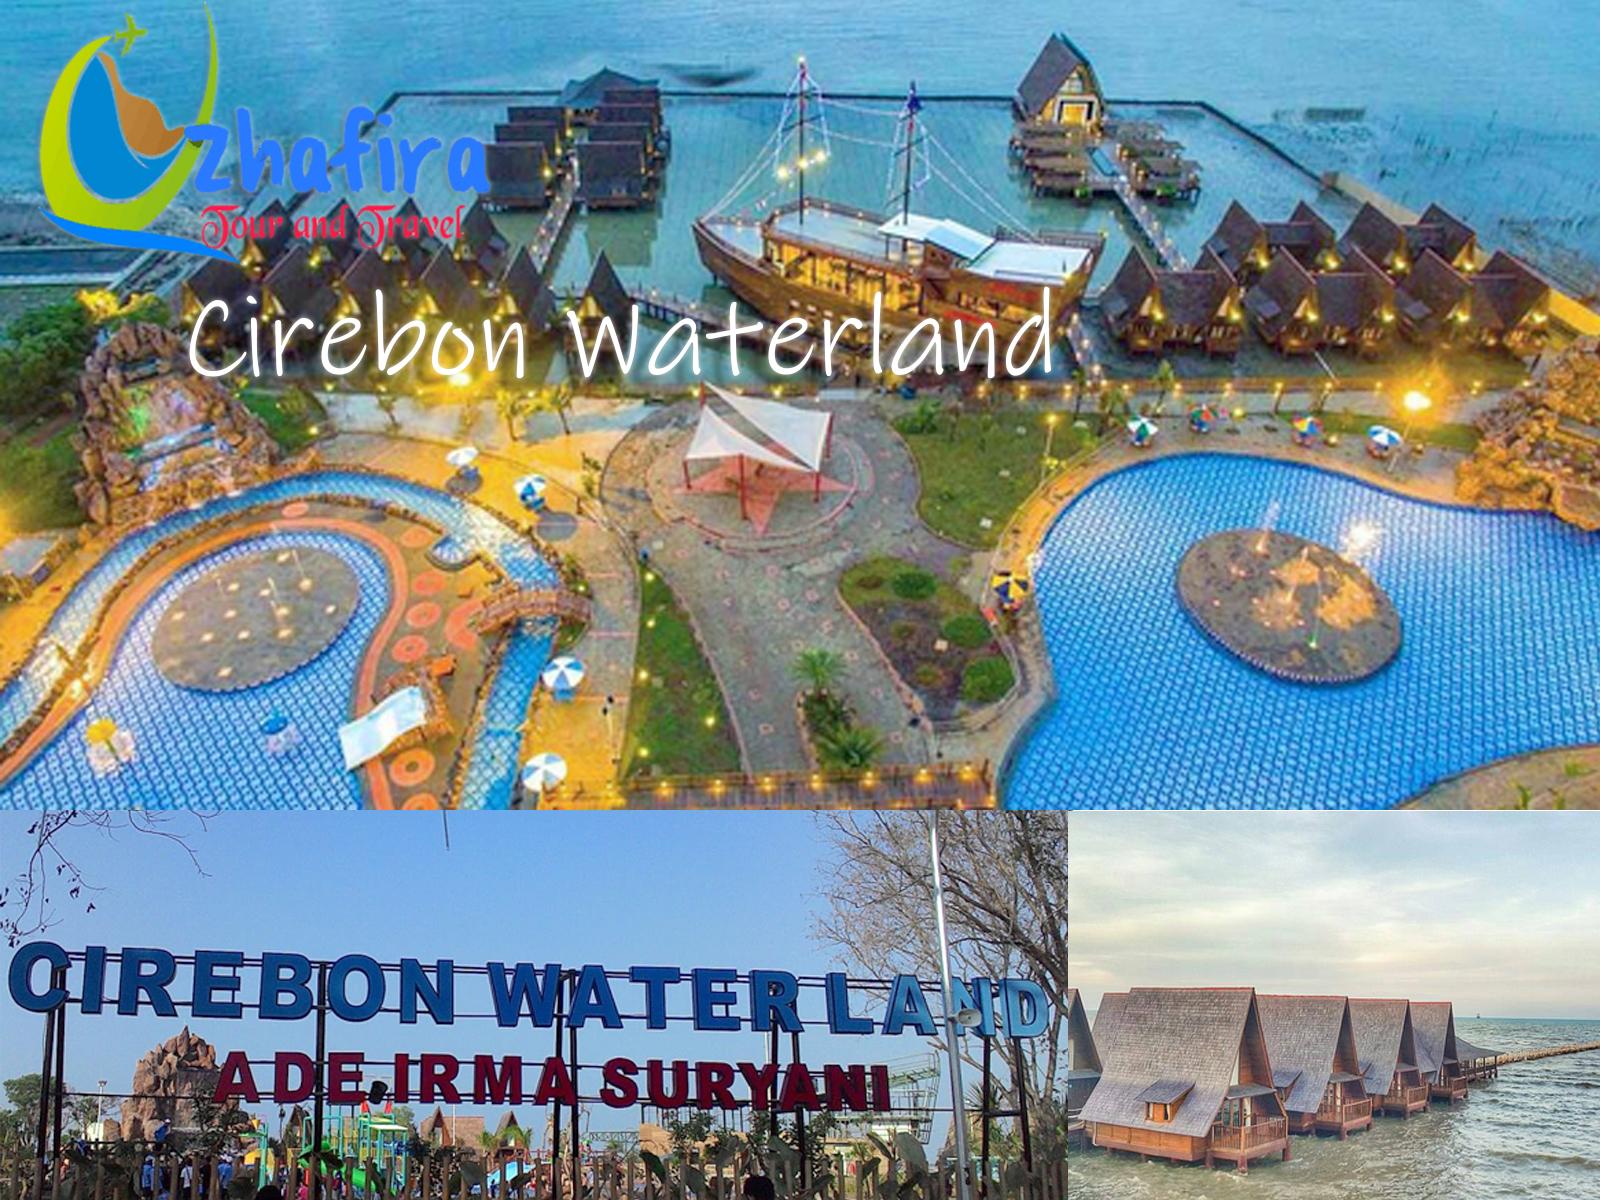 cirebon waterland